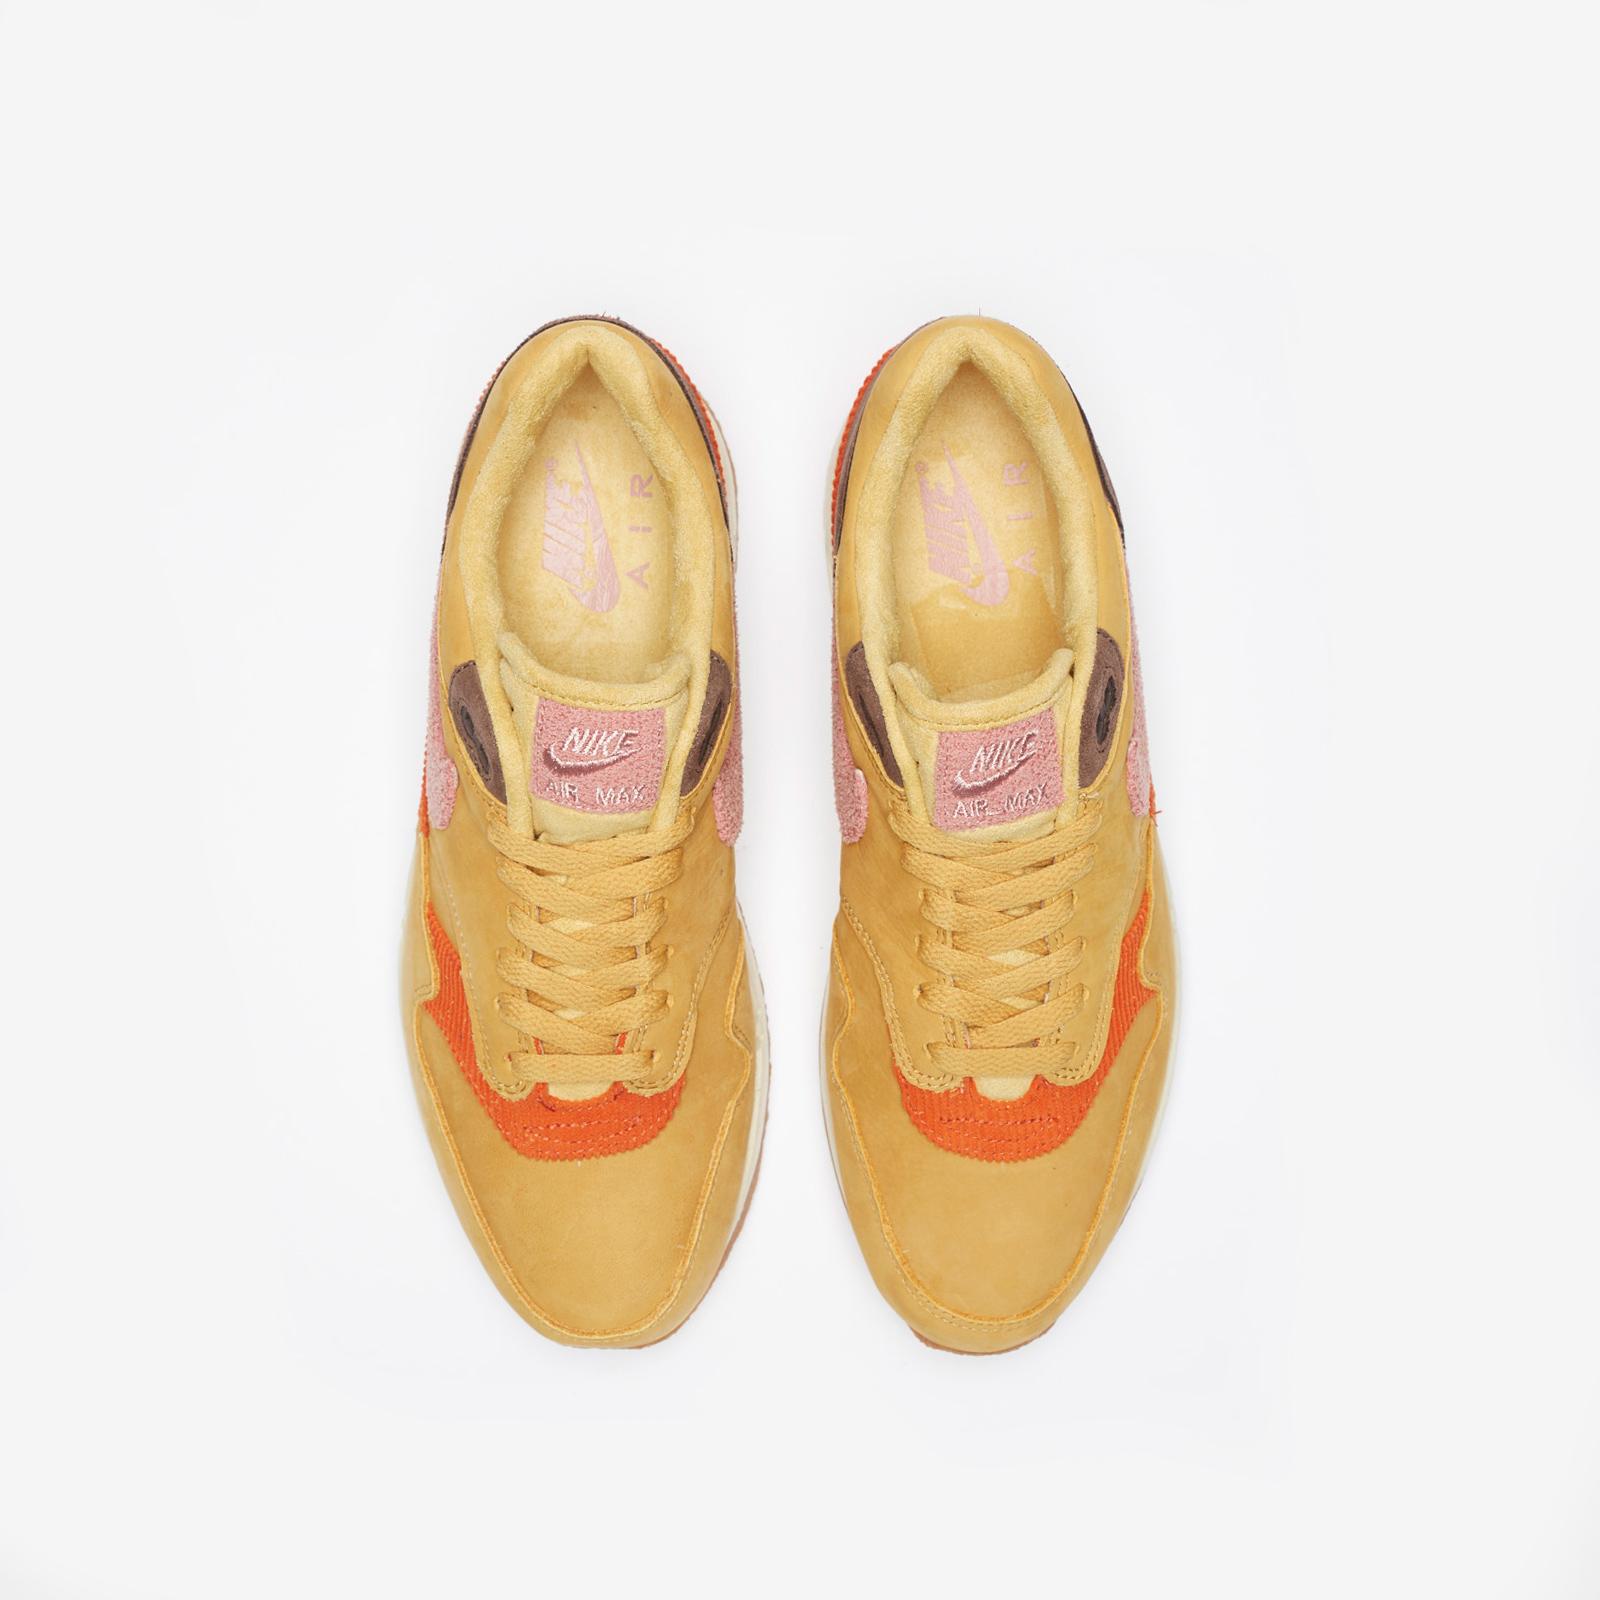 fc0cdc56f5 Nike Air Max 1 - Cd7861-700 - Sneakersnstuff | sneakers & streetwear online  since 1999